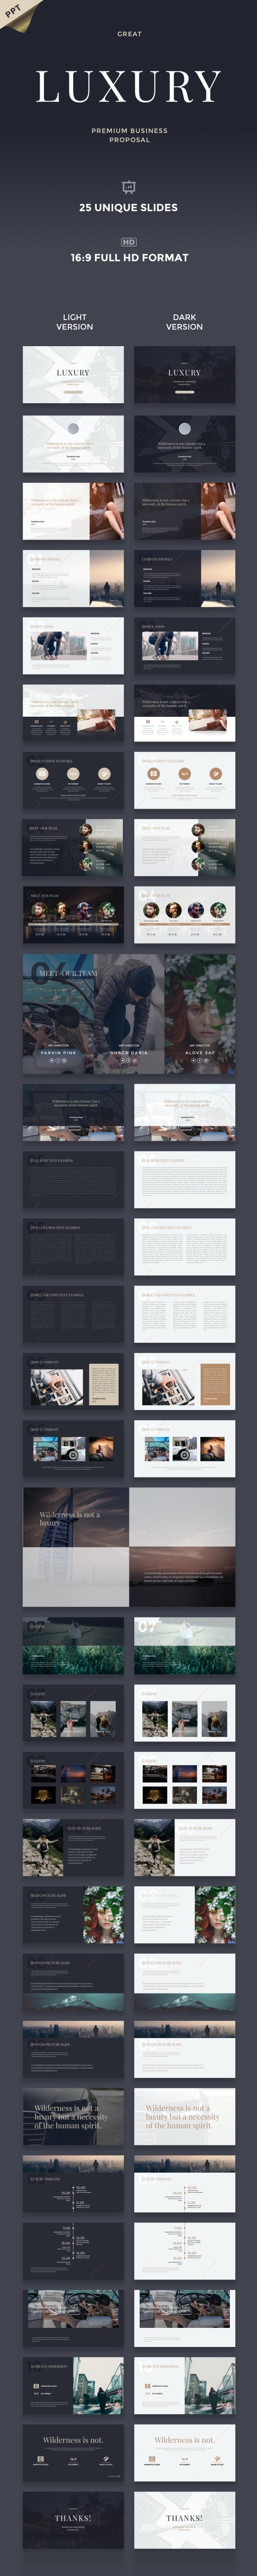 Great Luxury Premium Business Proposal - PowerPoint Template - Business PowerPoint Templates